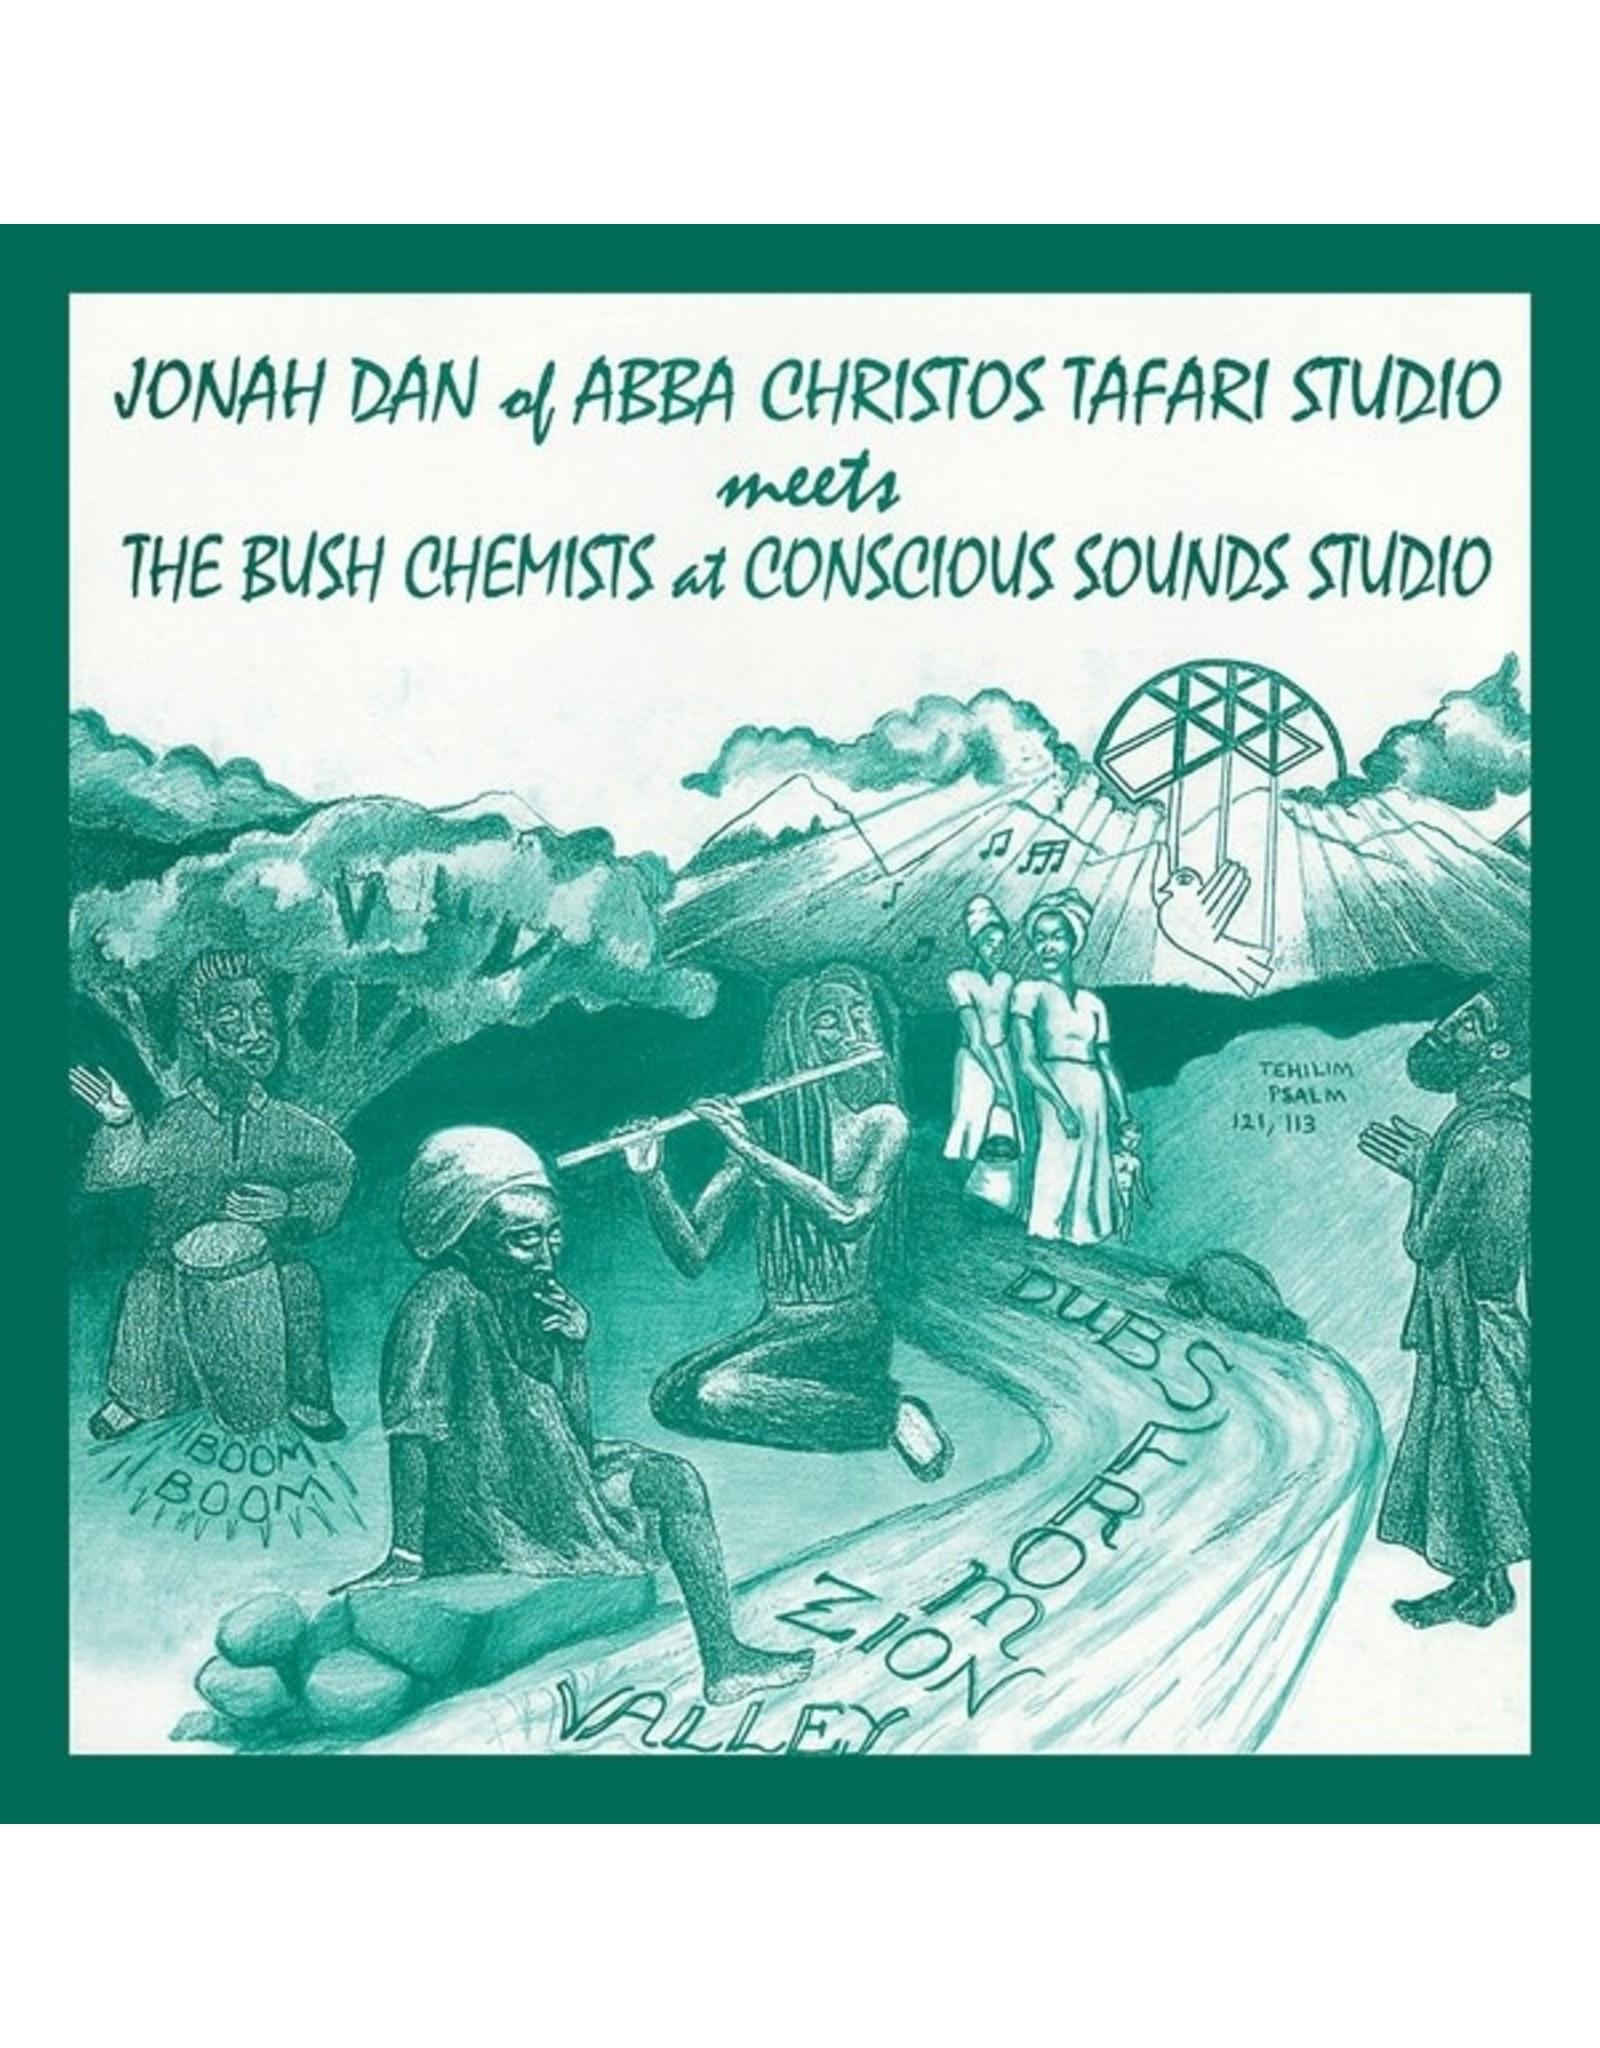 New Vinyl Jonah Dan Meets The Bush Chemists - Dubs From Zion Valley LP